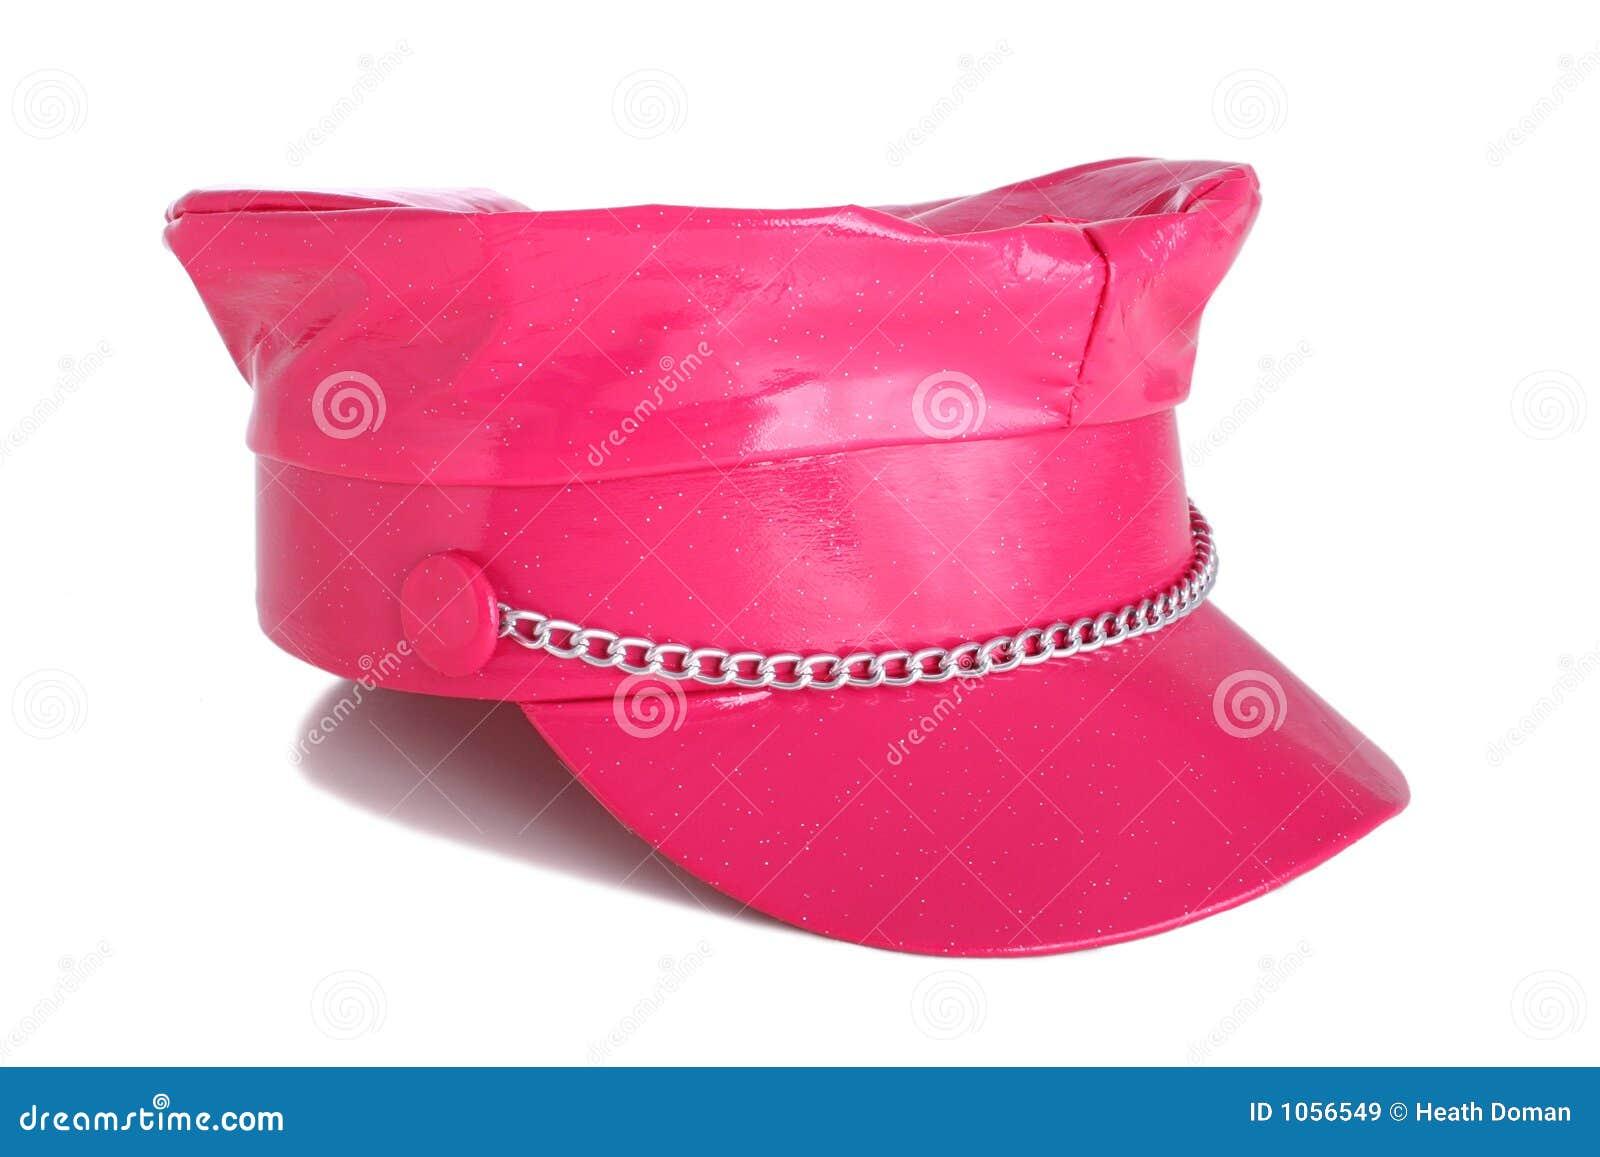 Bright Pink Hat Stock Image Image Of Vibrant, Head, Ladies - 1056549-6687